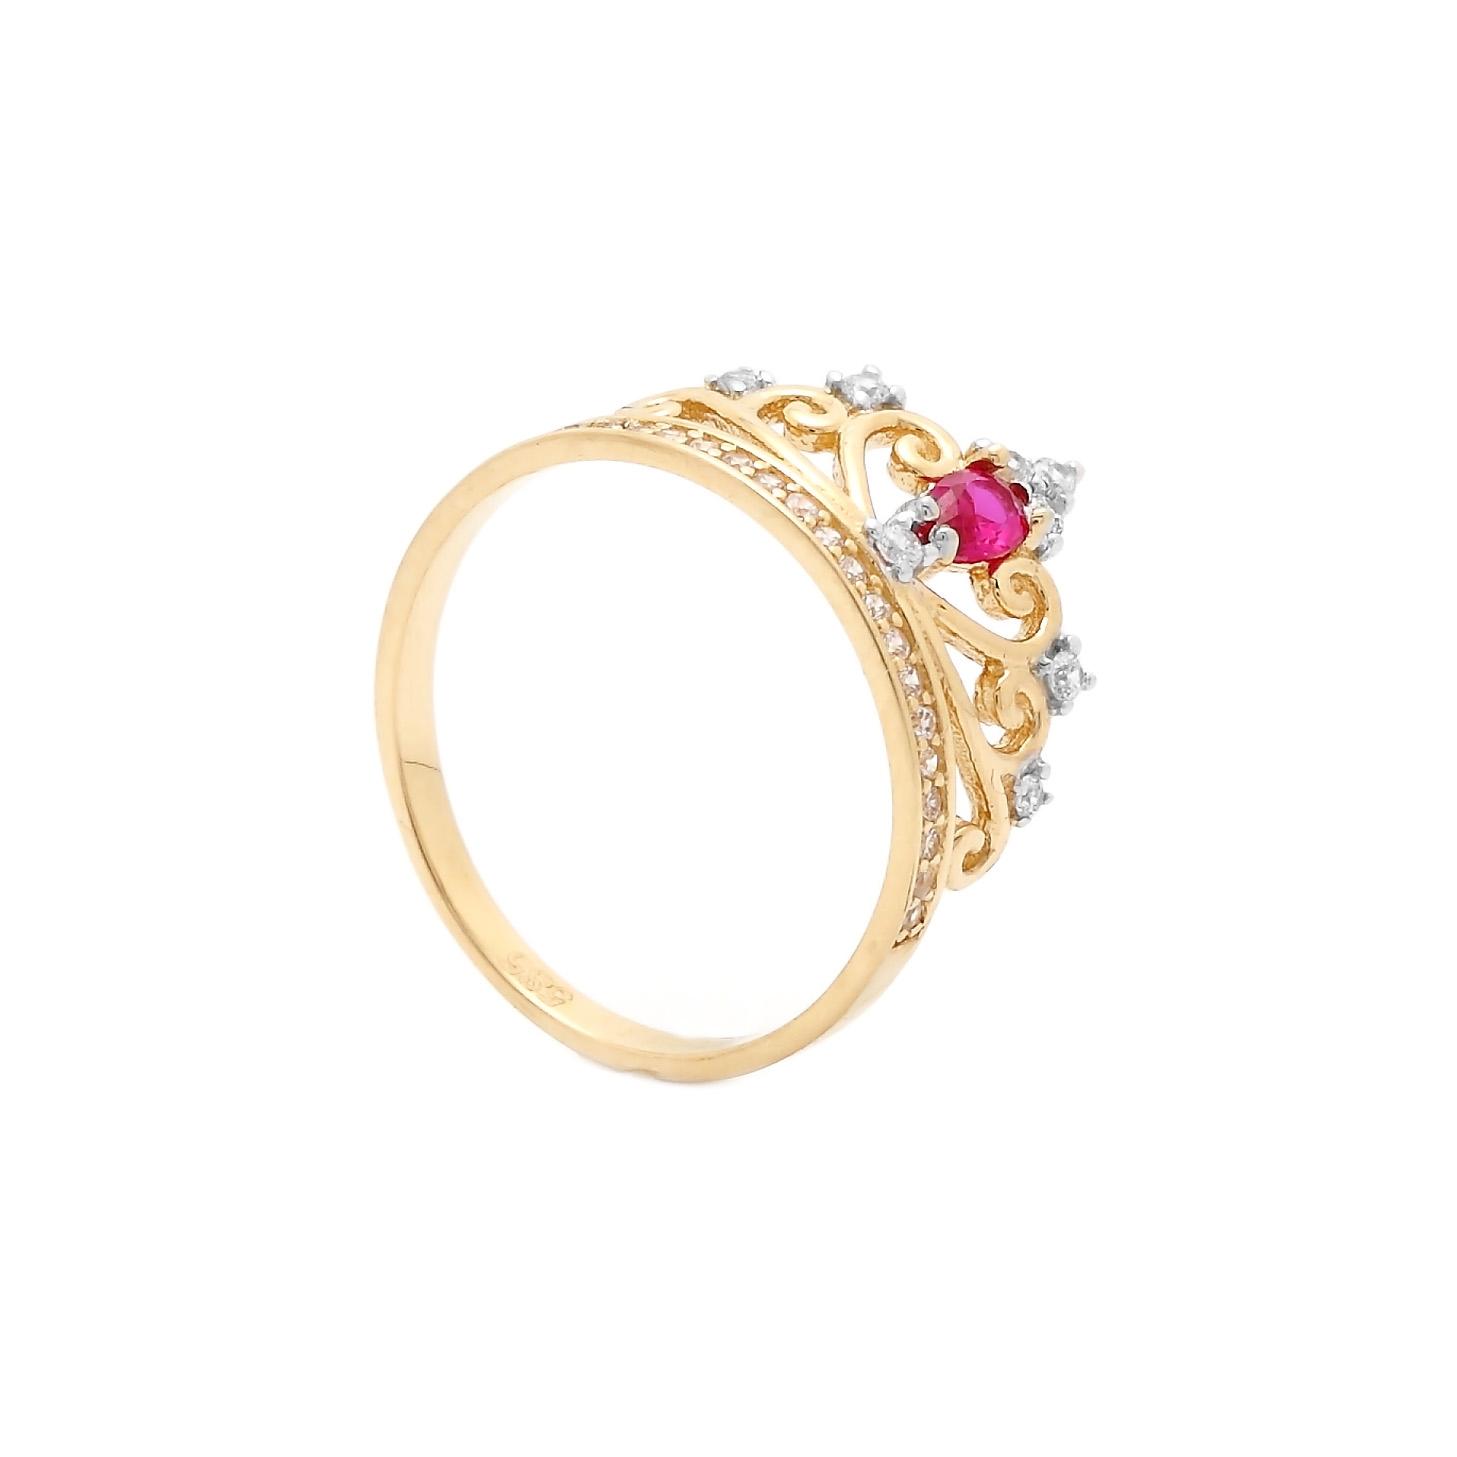 Zlatý prsteň REINE s rubínom